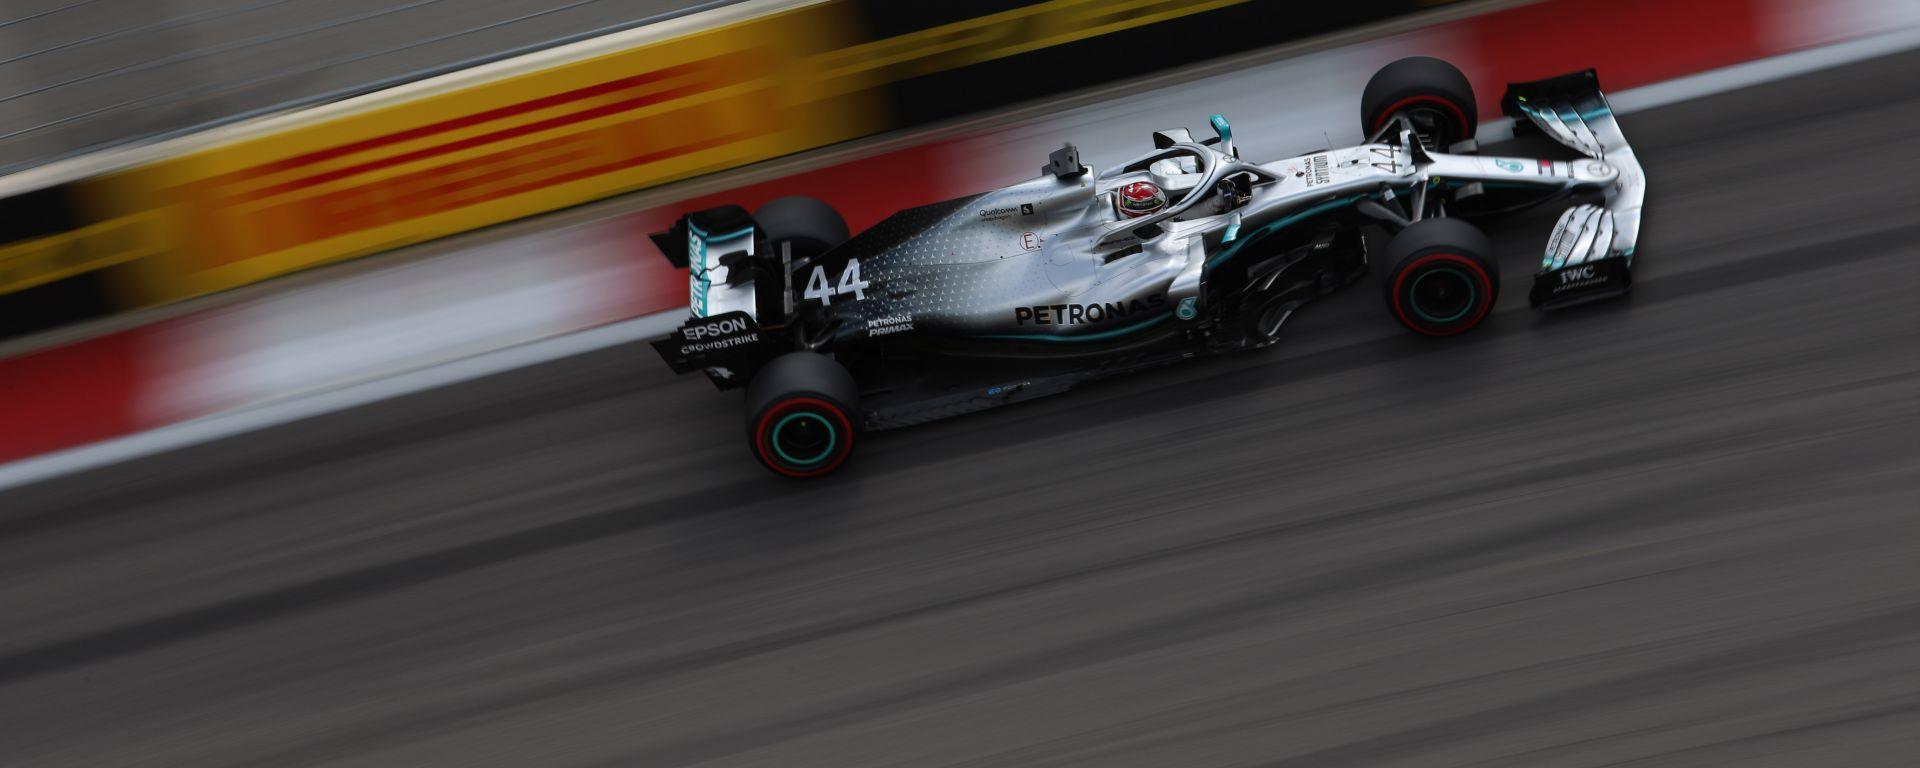 GP Russia 2019: Hamilton-Bottas, la Mercedes beffa la Ferrari